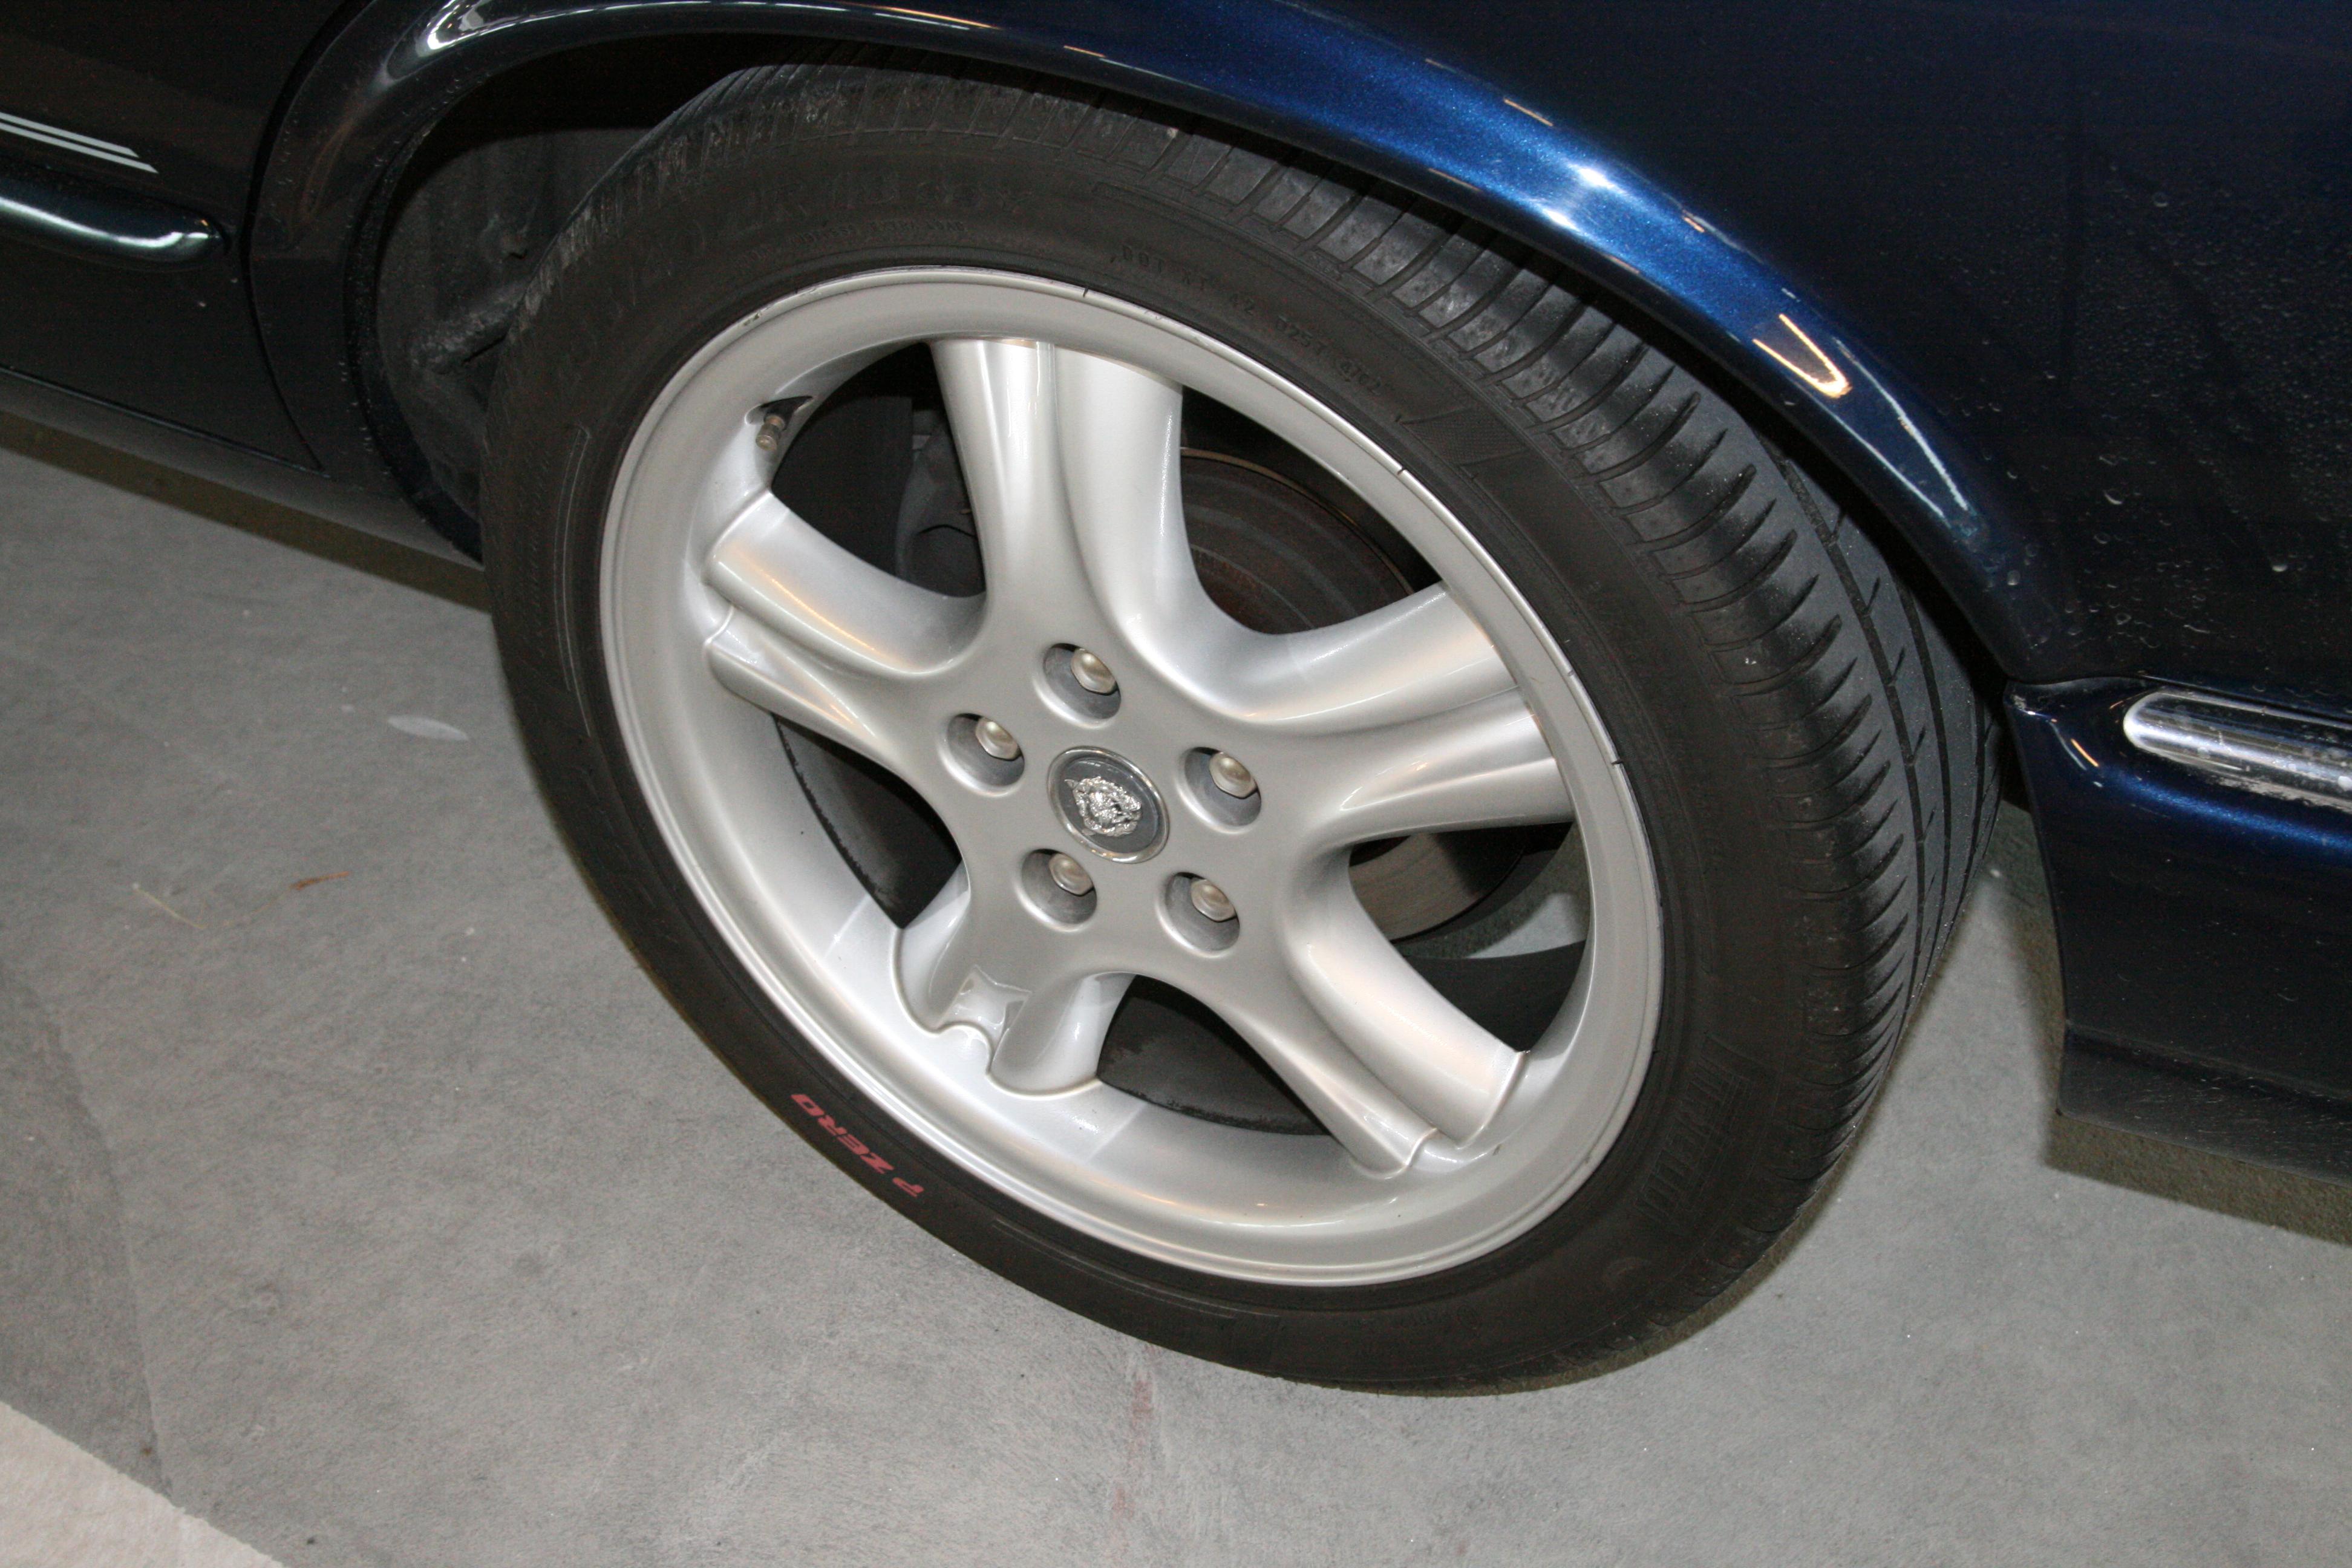 original page catalog rim front factory xe for sale jaguar wheels wheel used